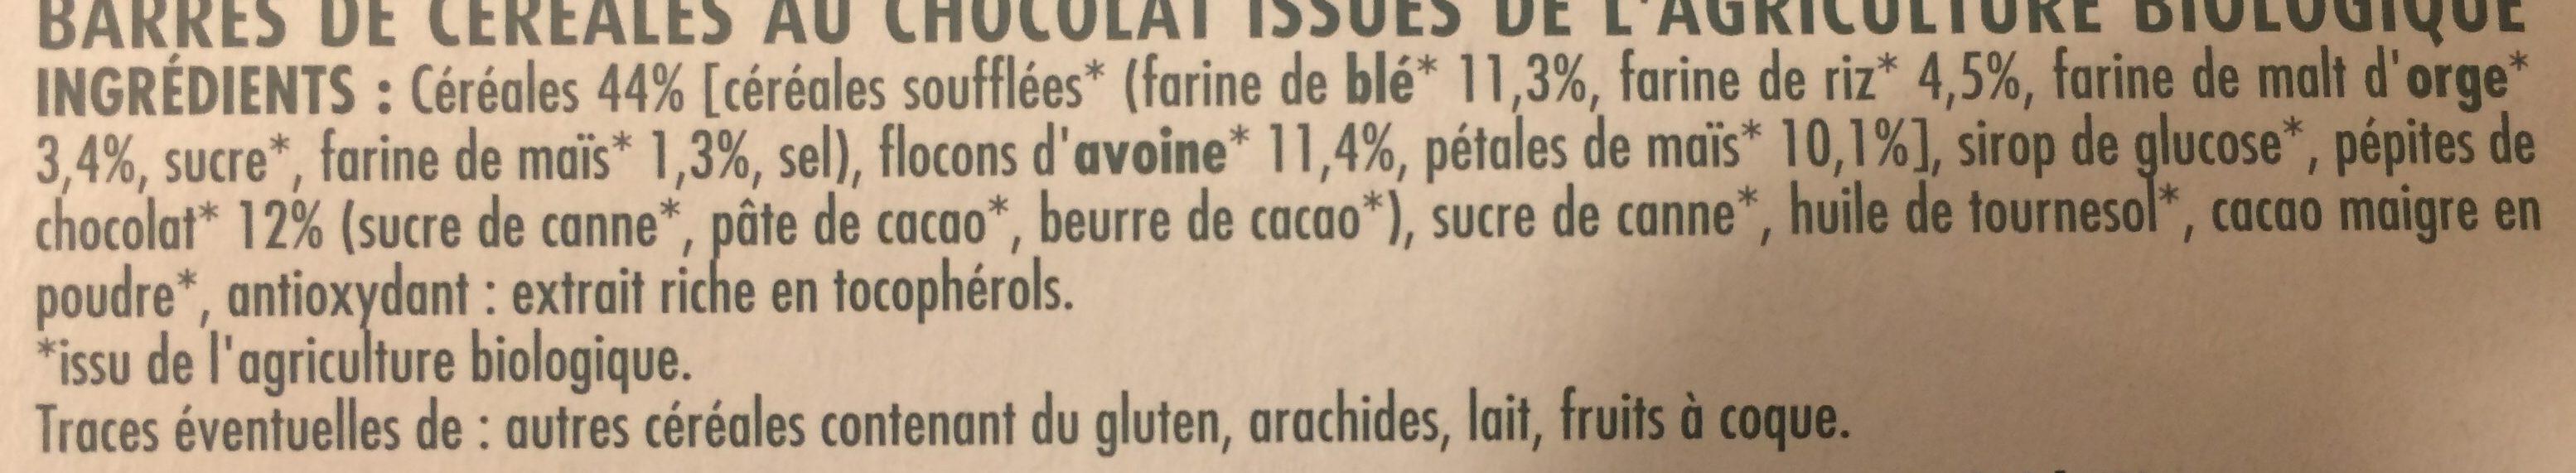 Barre chocolat 5 céreales - Ingrediënten - fr